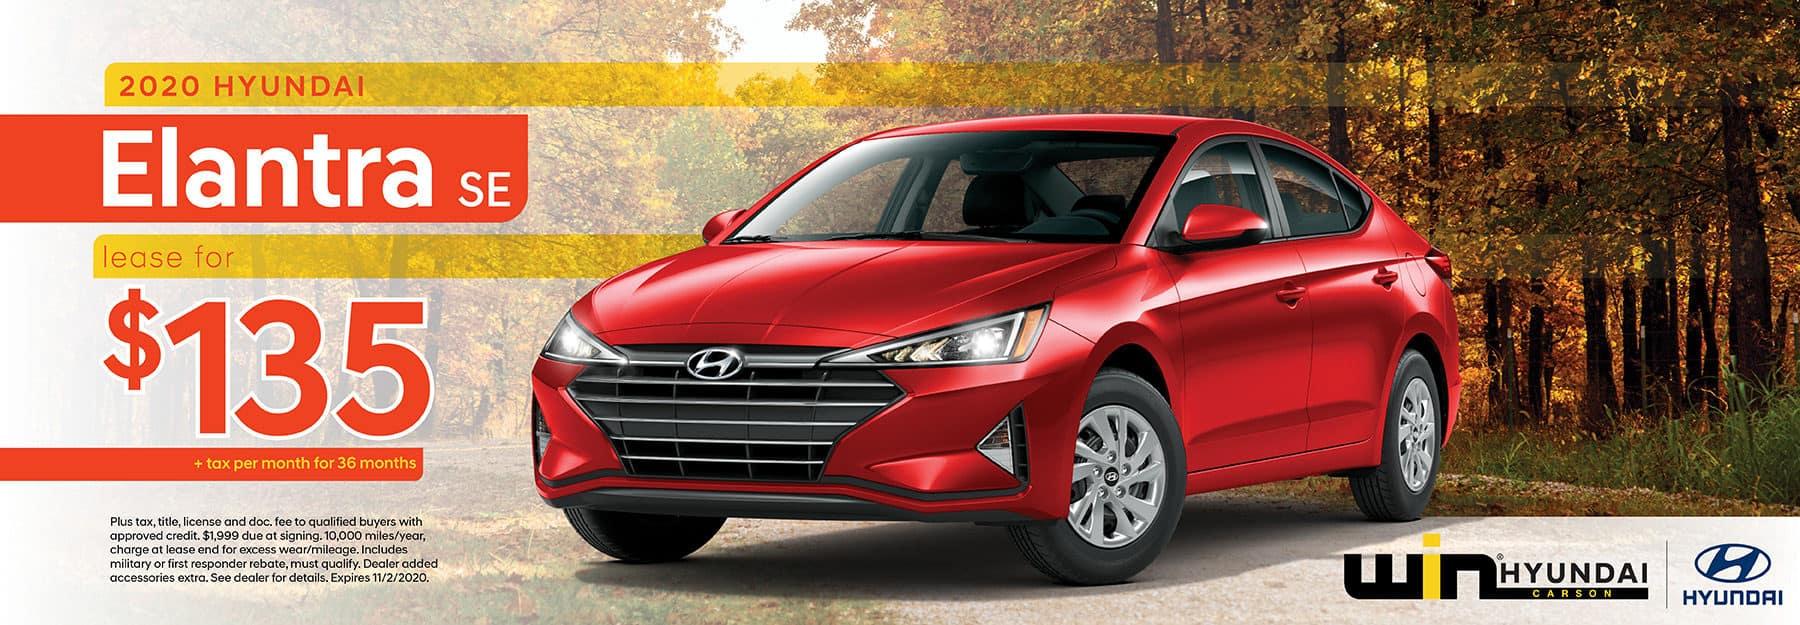 2020 Hyundai Elantra SE Lease for $135 | Carson, CA